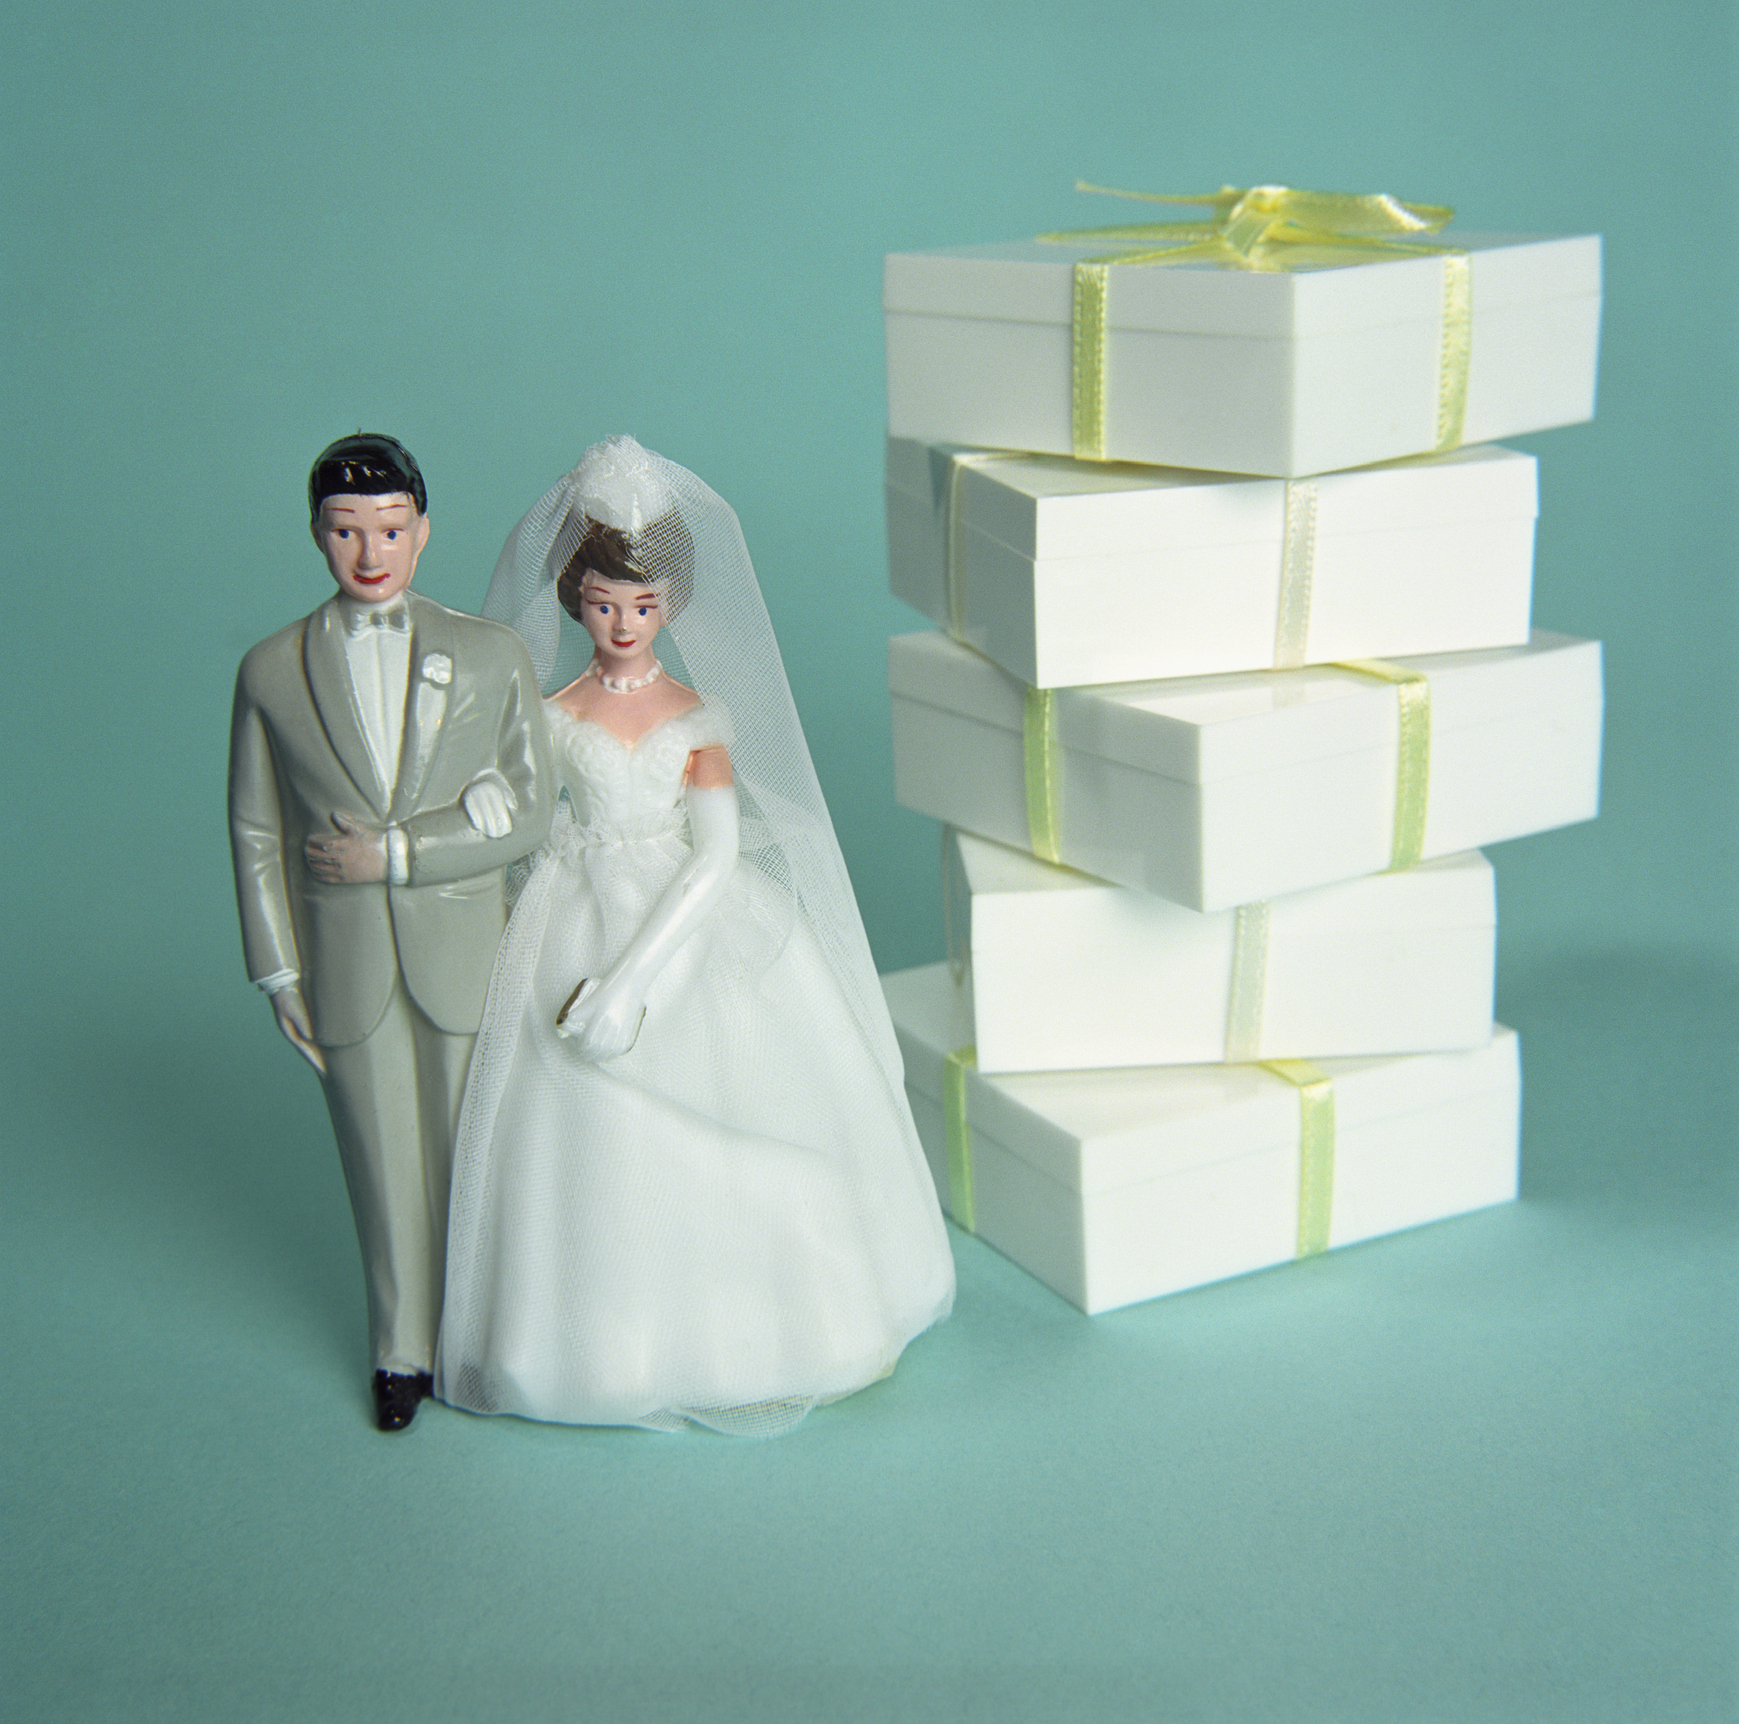 17 thoughtful wedding gift ideas under £20